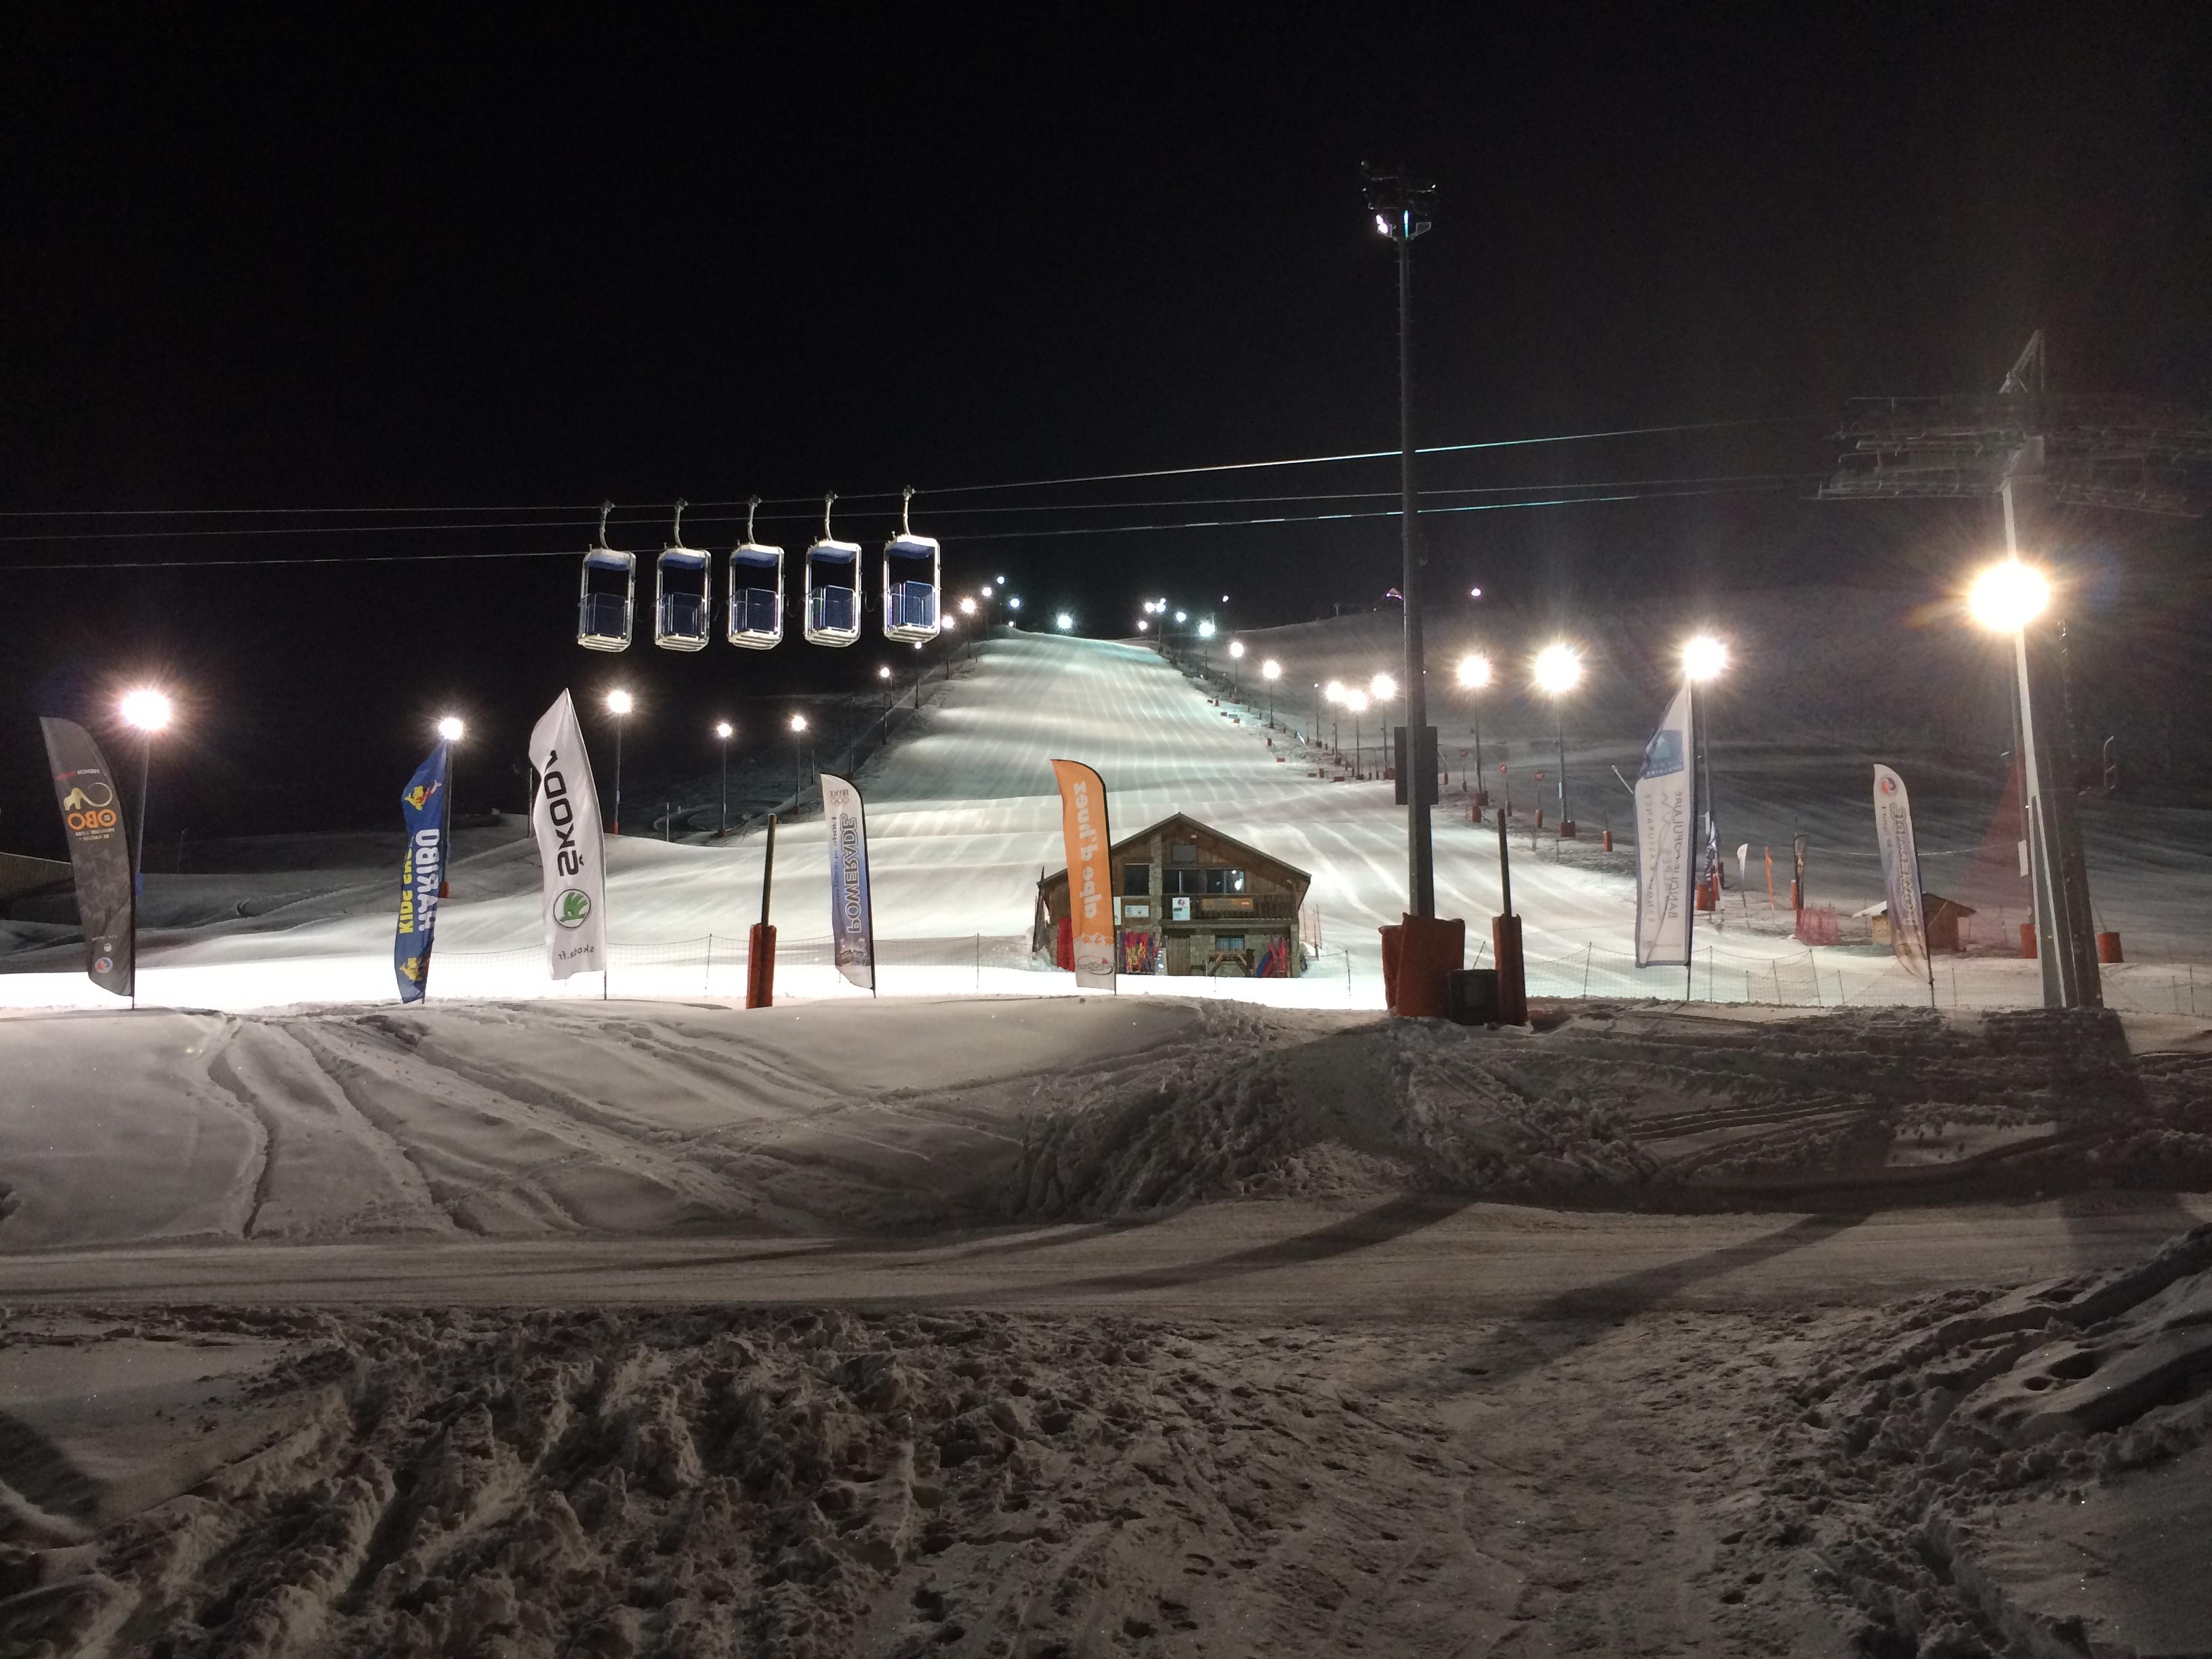 Night ski, Alpe d'Huez